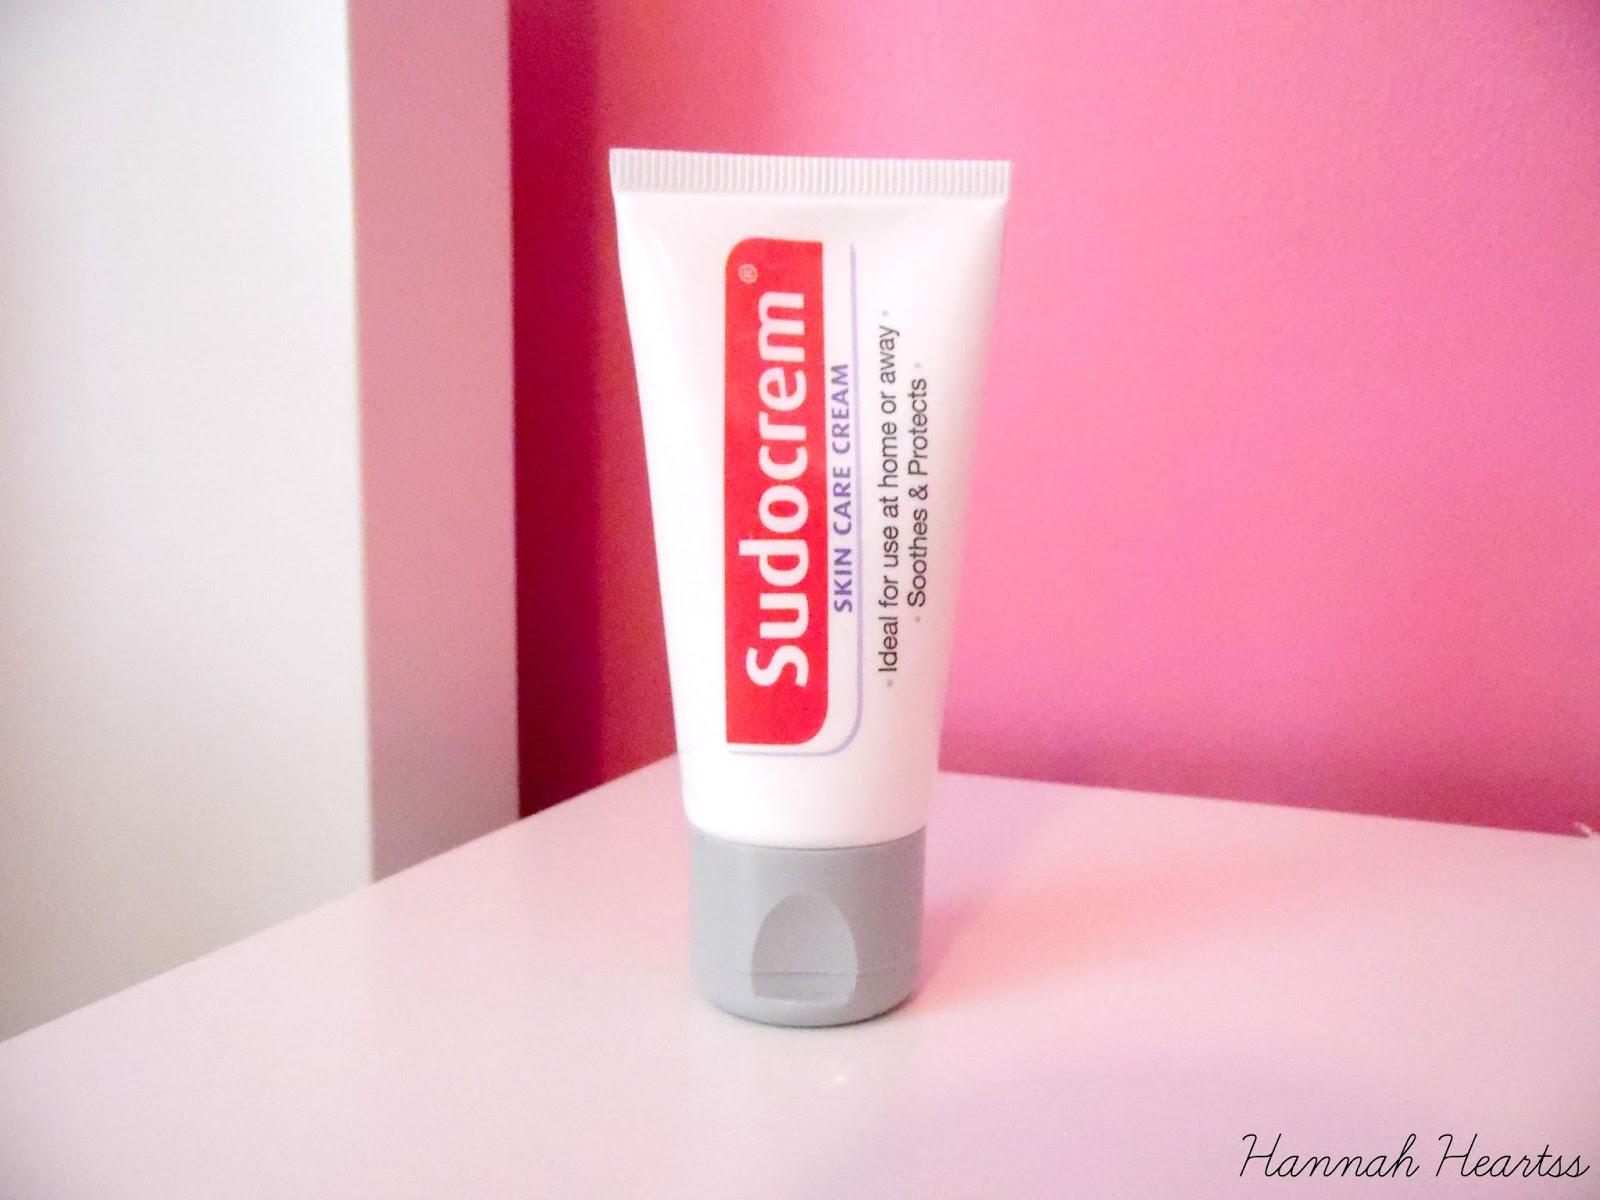 Sudocrem Skin Care Cream